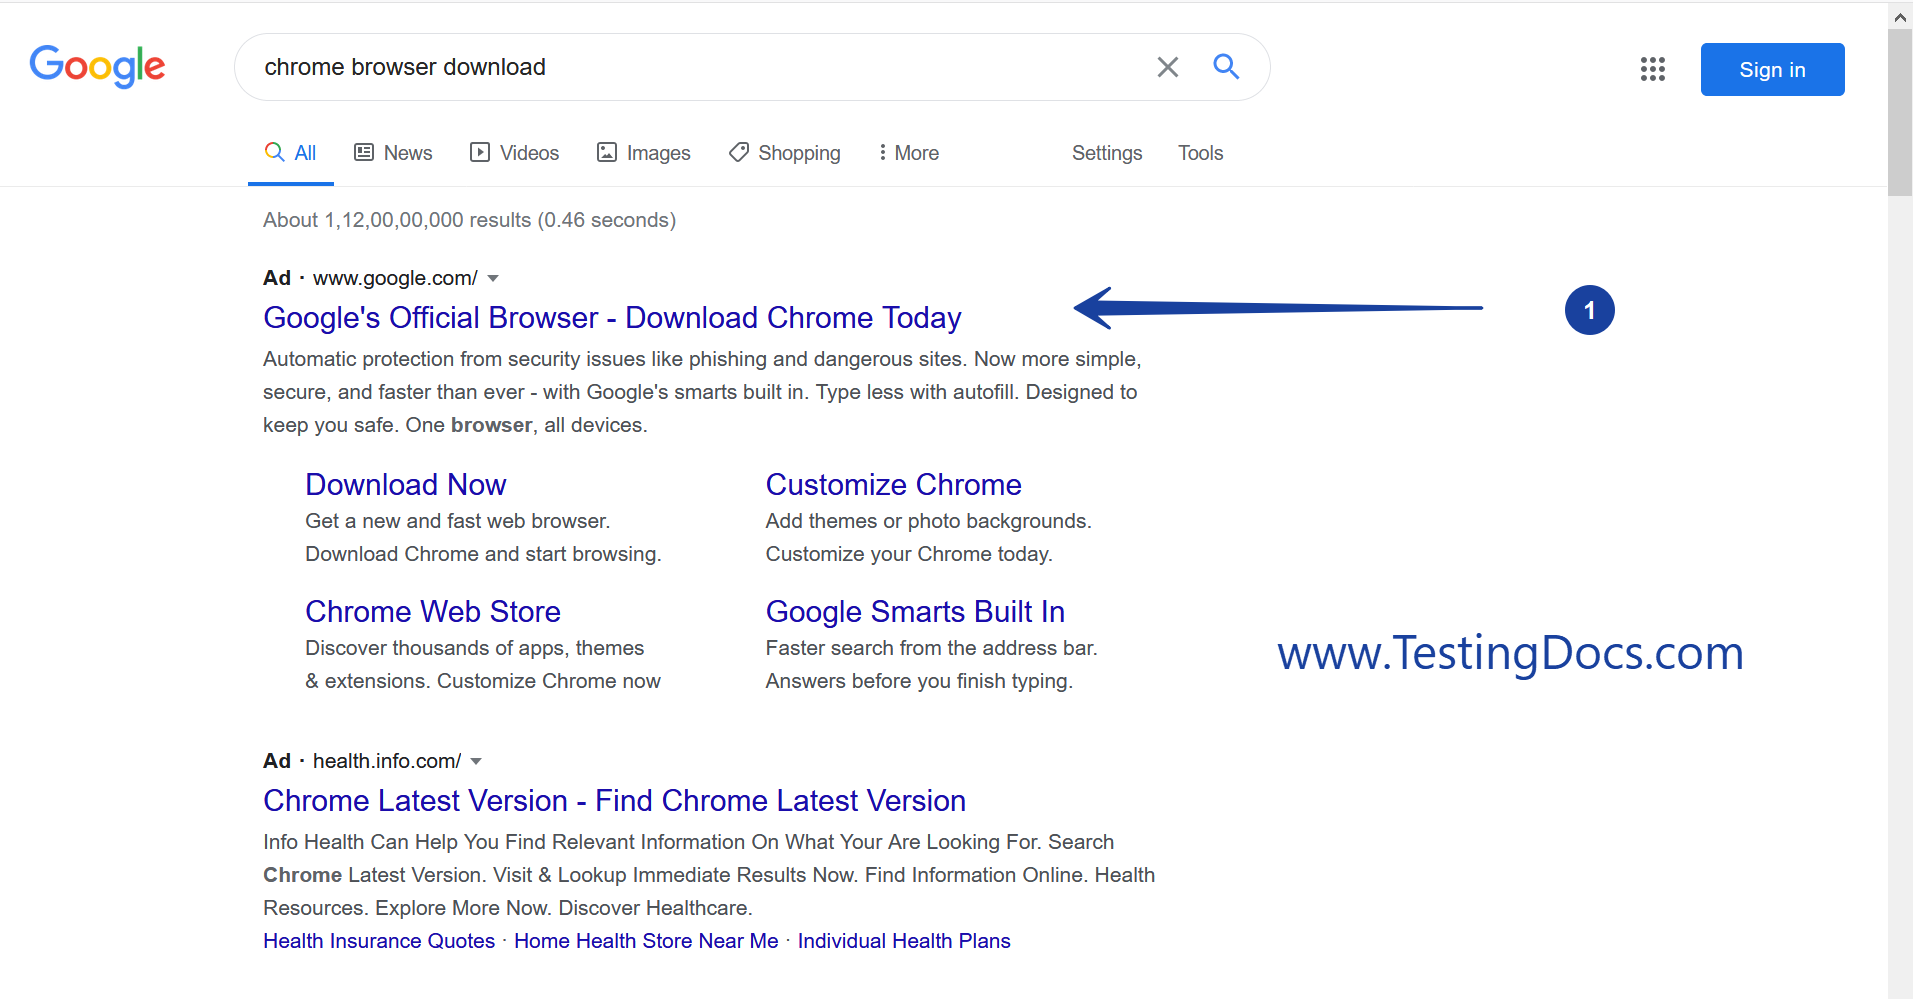 Google Chrome Browser Download